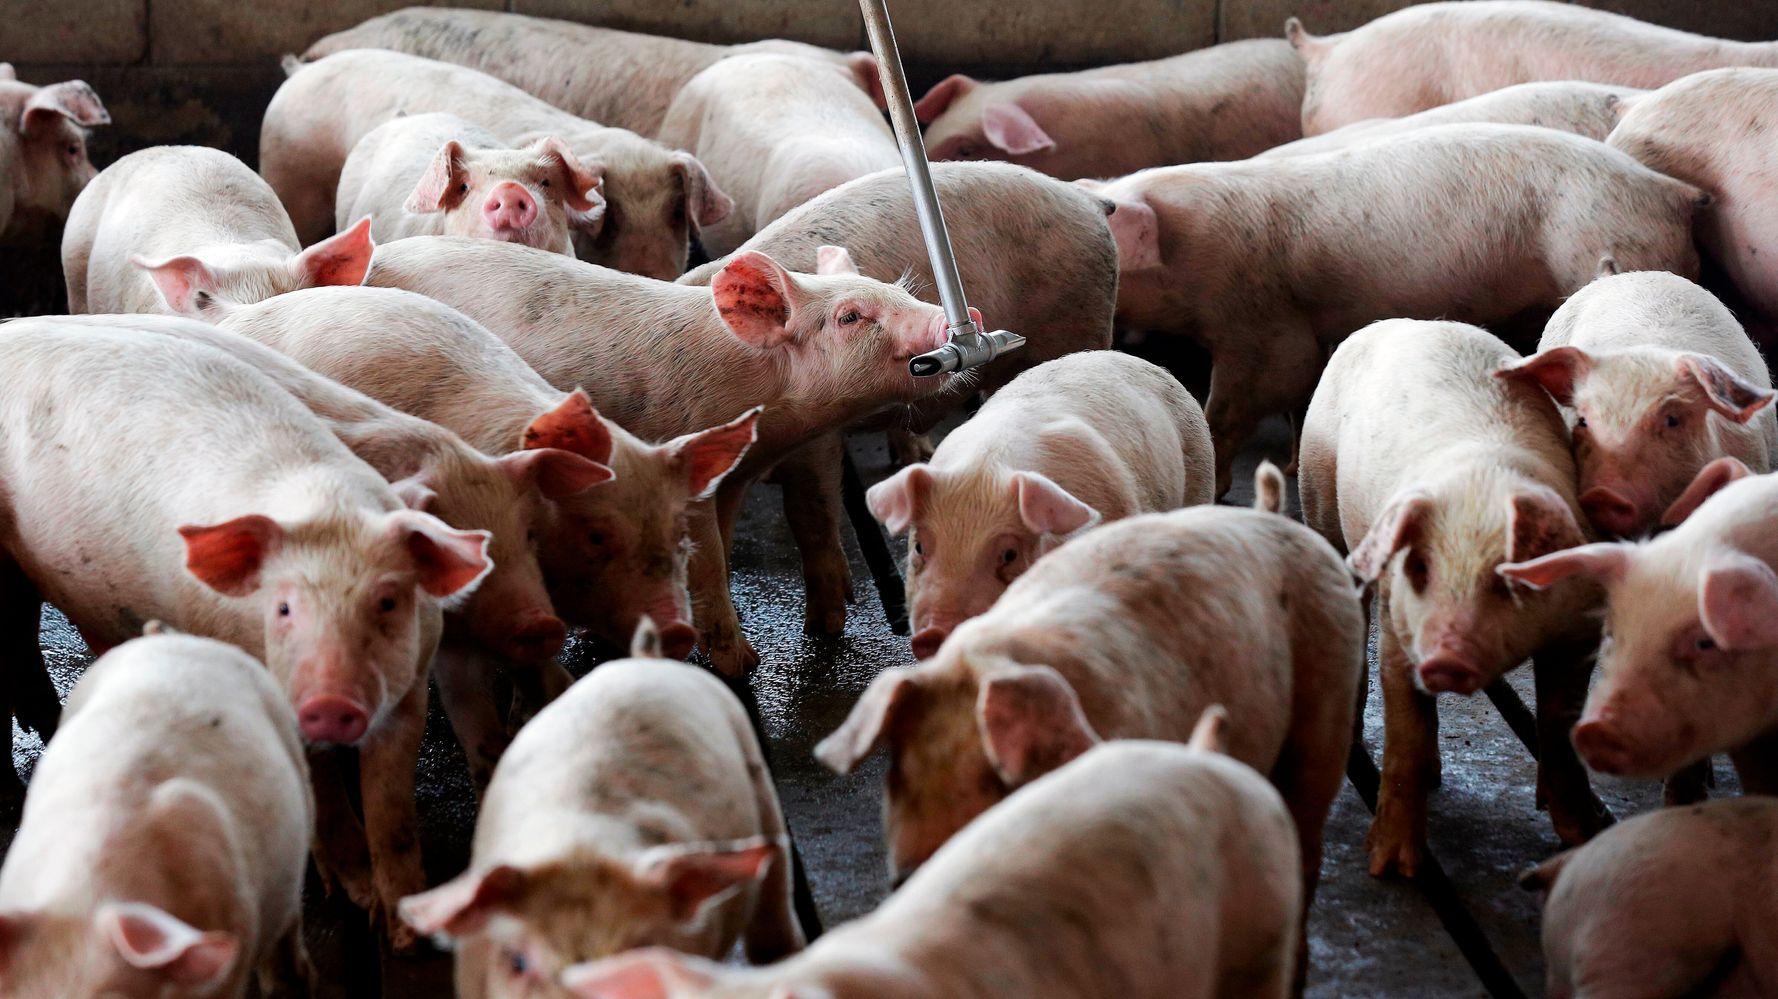 Court Upholds Verdict That Smithfield Must Pay For Making Life Near Hog Operation Miserable